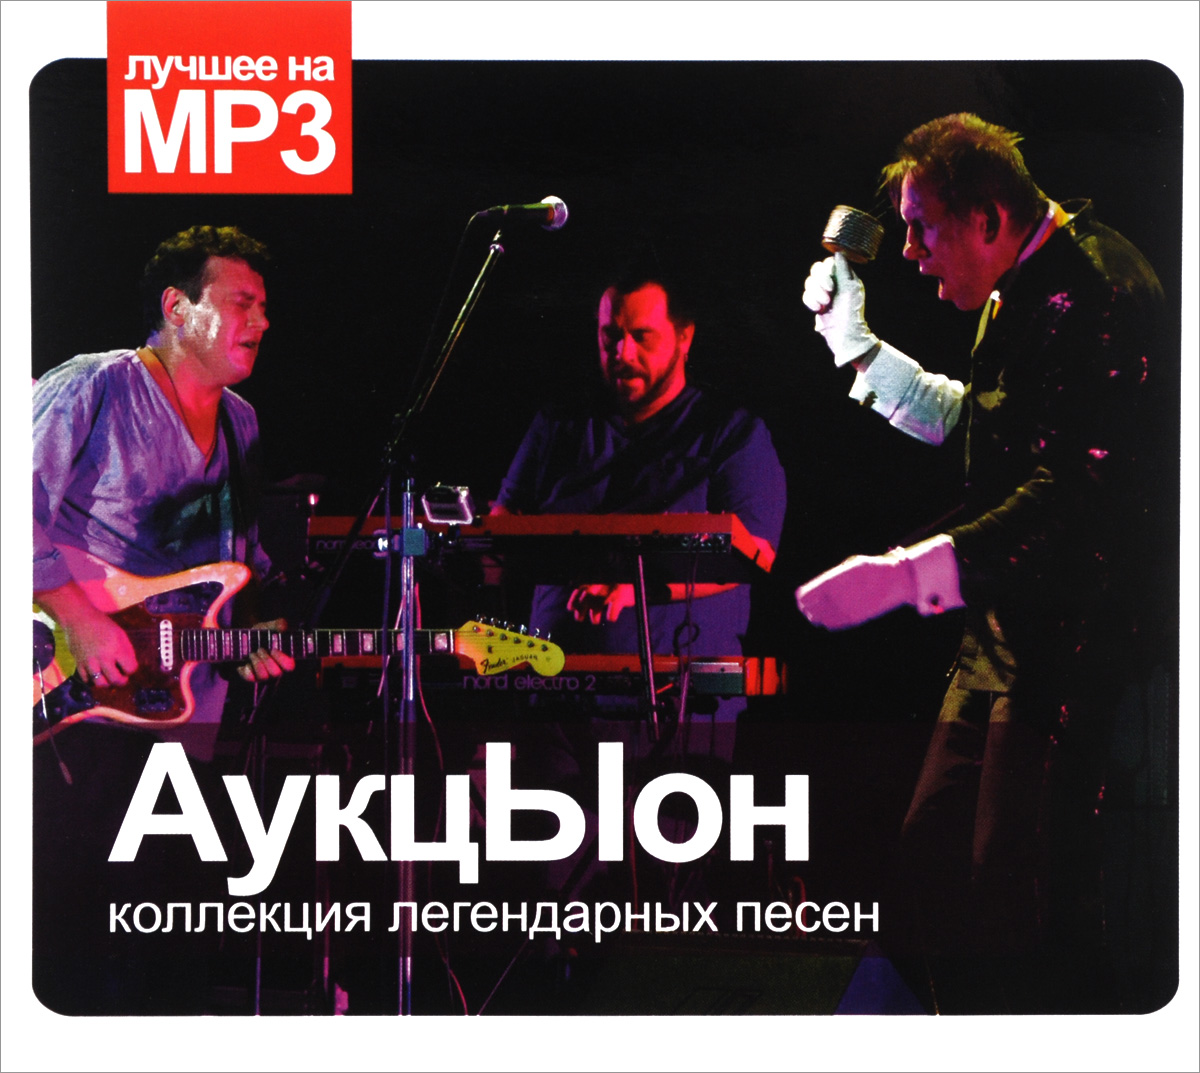 АукцЫон АукцЫон. Коллекция легендарных песен (mp3) аукцыон хвост и аукцыон жилец вершин 2 cd dvd